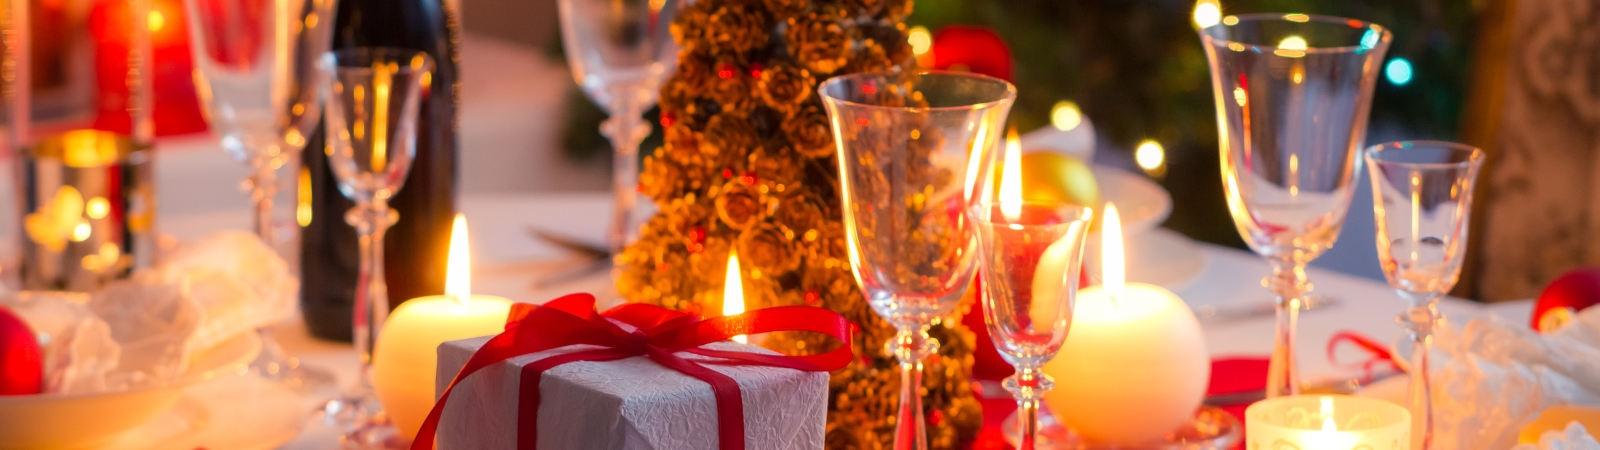 Spend Christmas in Devon UK